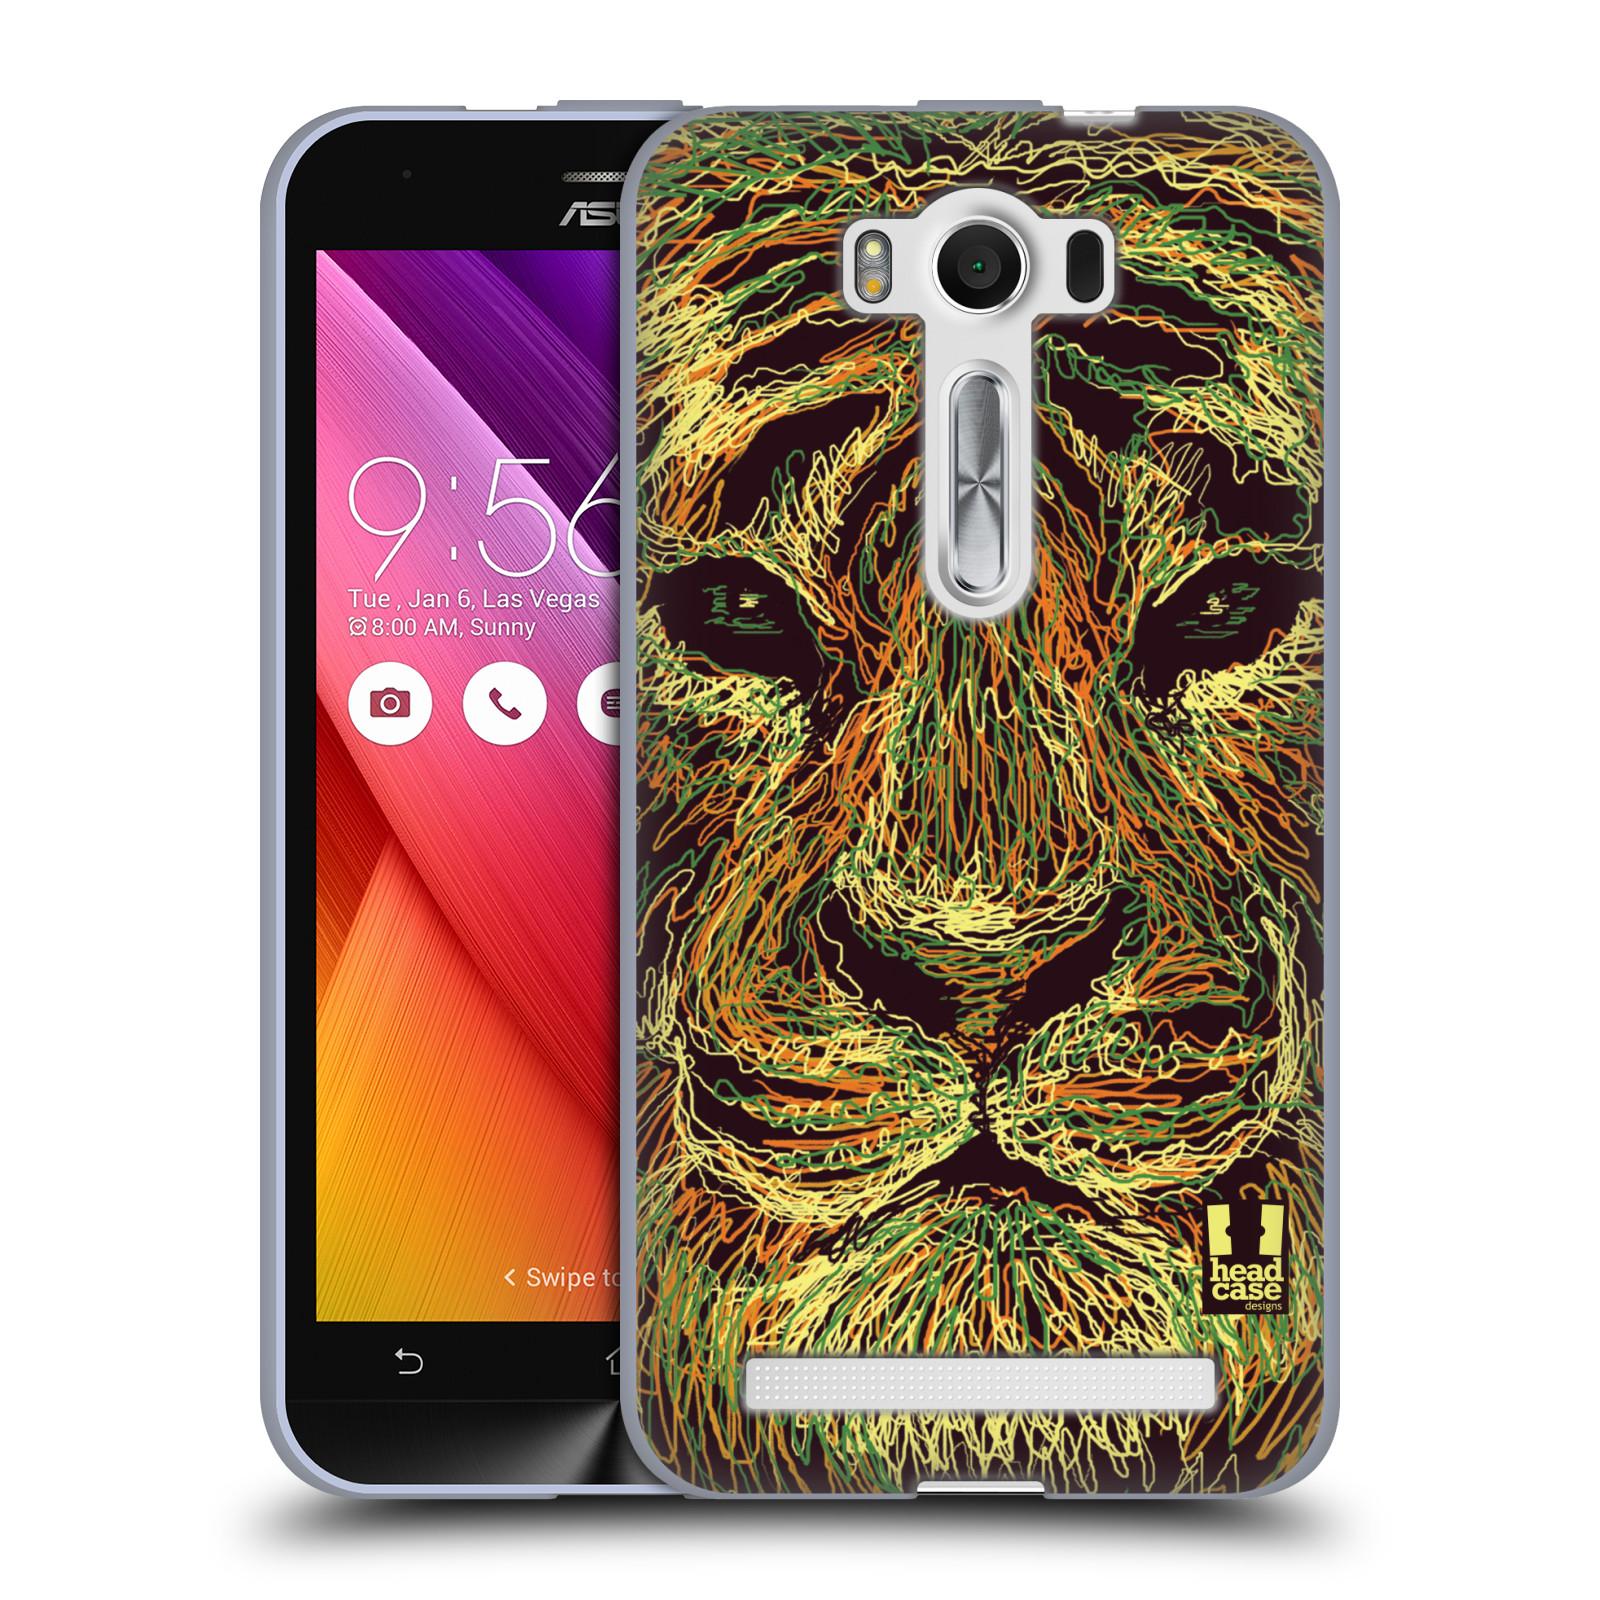 "HEAD CASE silikonový obal na mobil Asus Zenfone 2 LASER (ZE500KL s 5"" displejem) vzor zvíře čmáranice tygr"